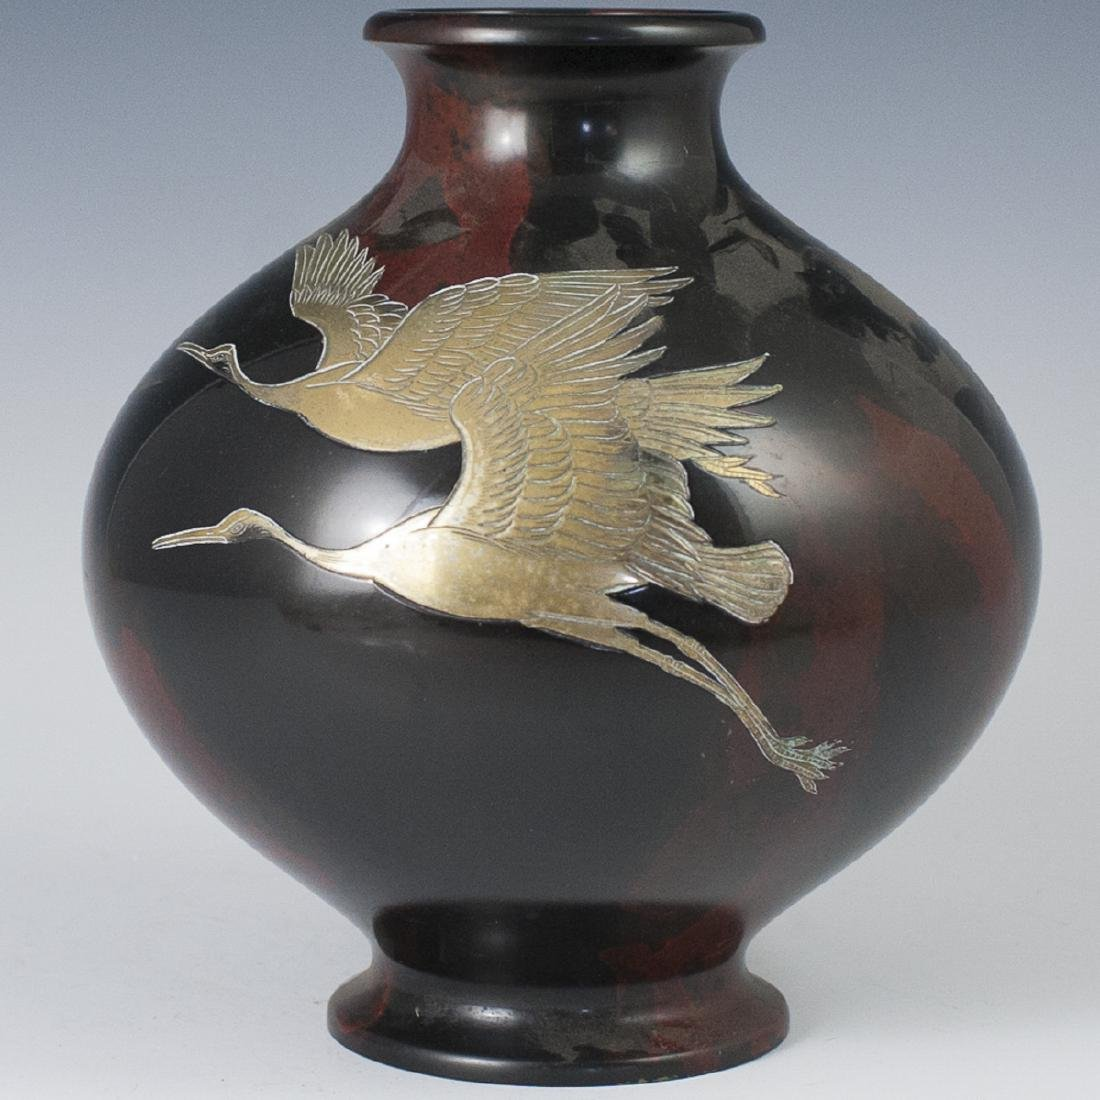 Japanese Mixed Metal Stamped Bronze Vase